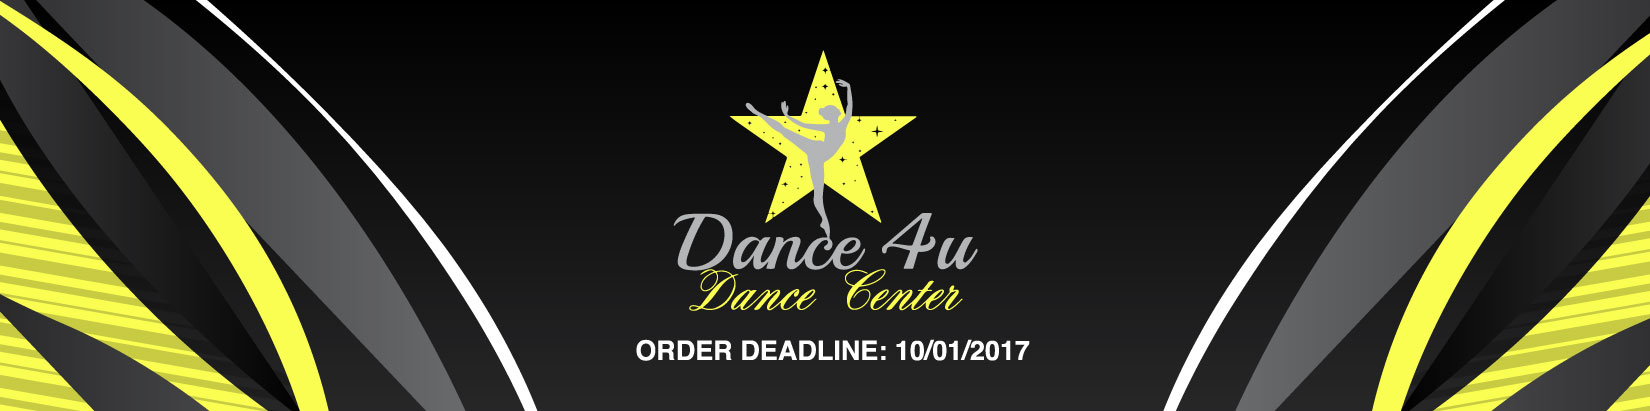 Dance 4 U